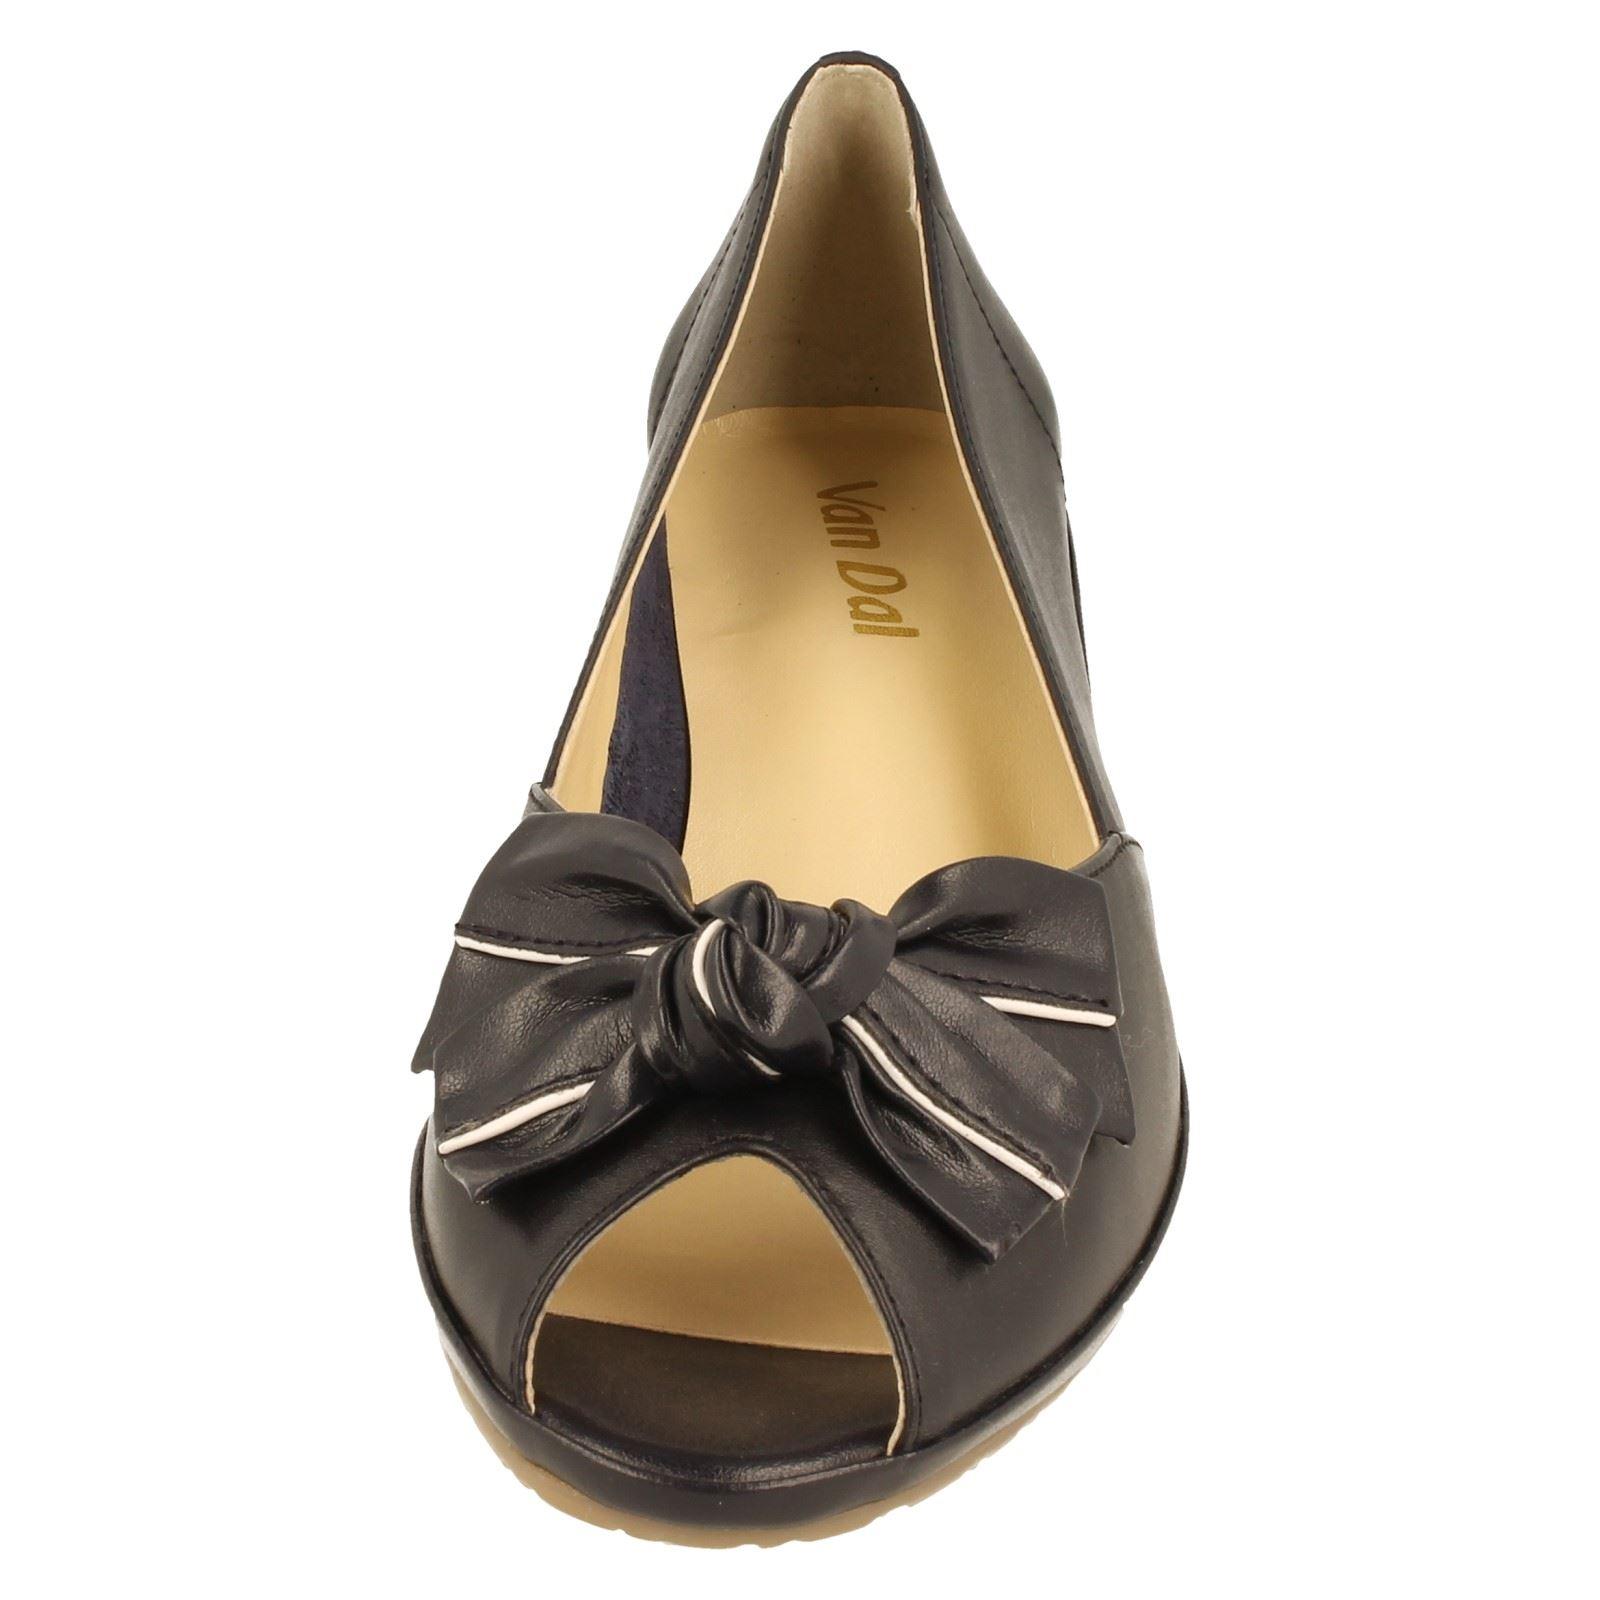 Van Dal Wedged Shoe The -W Style Florida II -W The e73b21